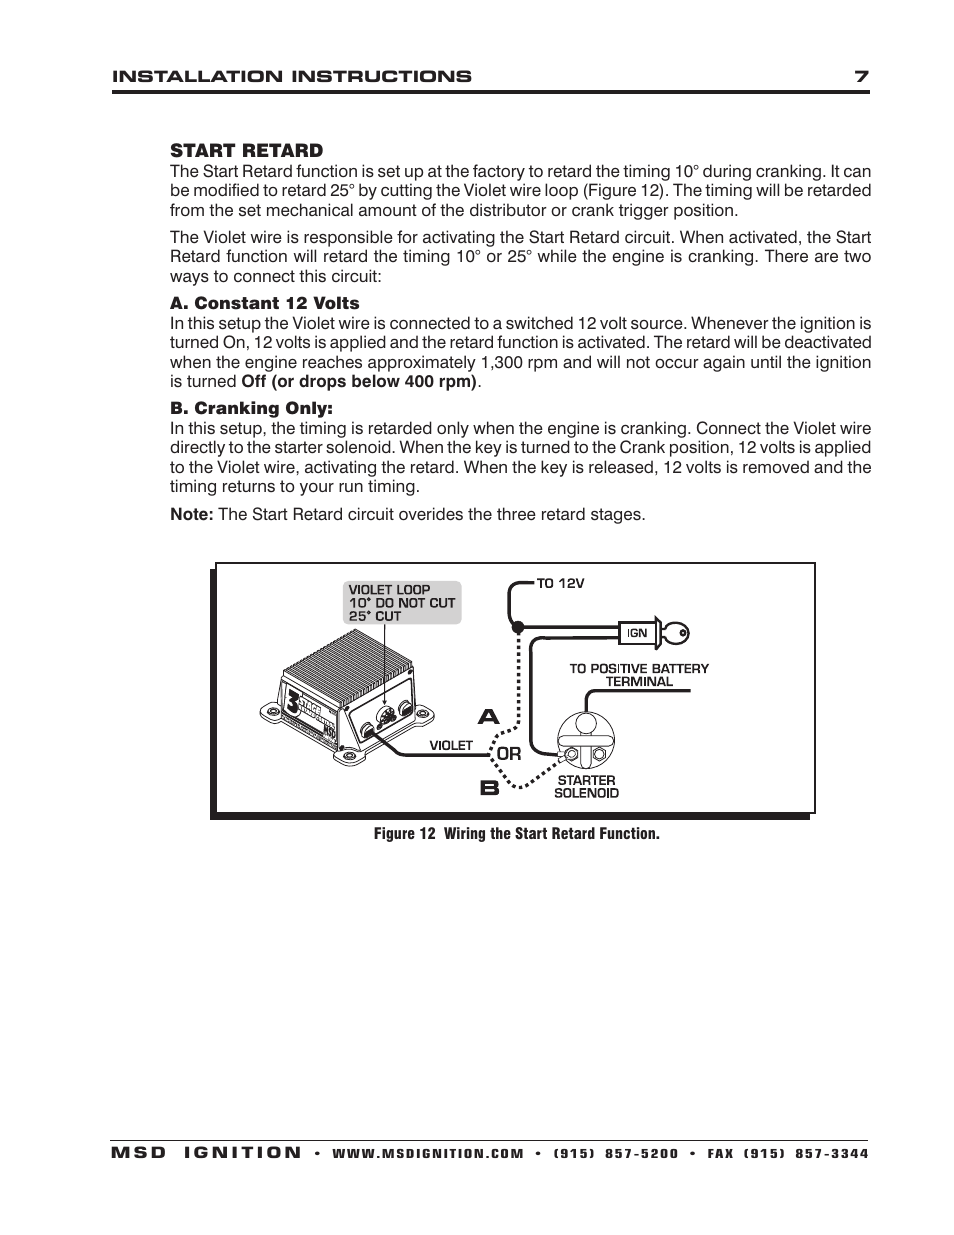 hight resolution of msd 8970 three stage retard control installation user manual page 7 8